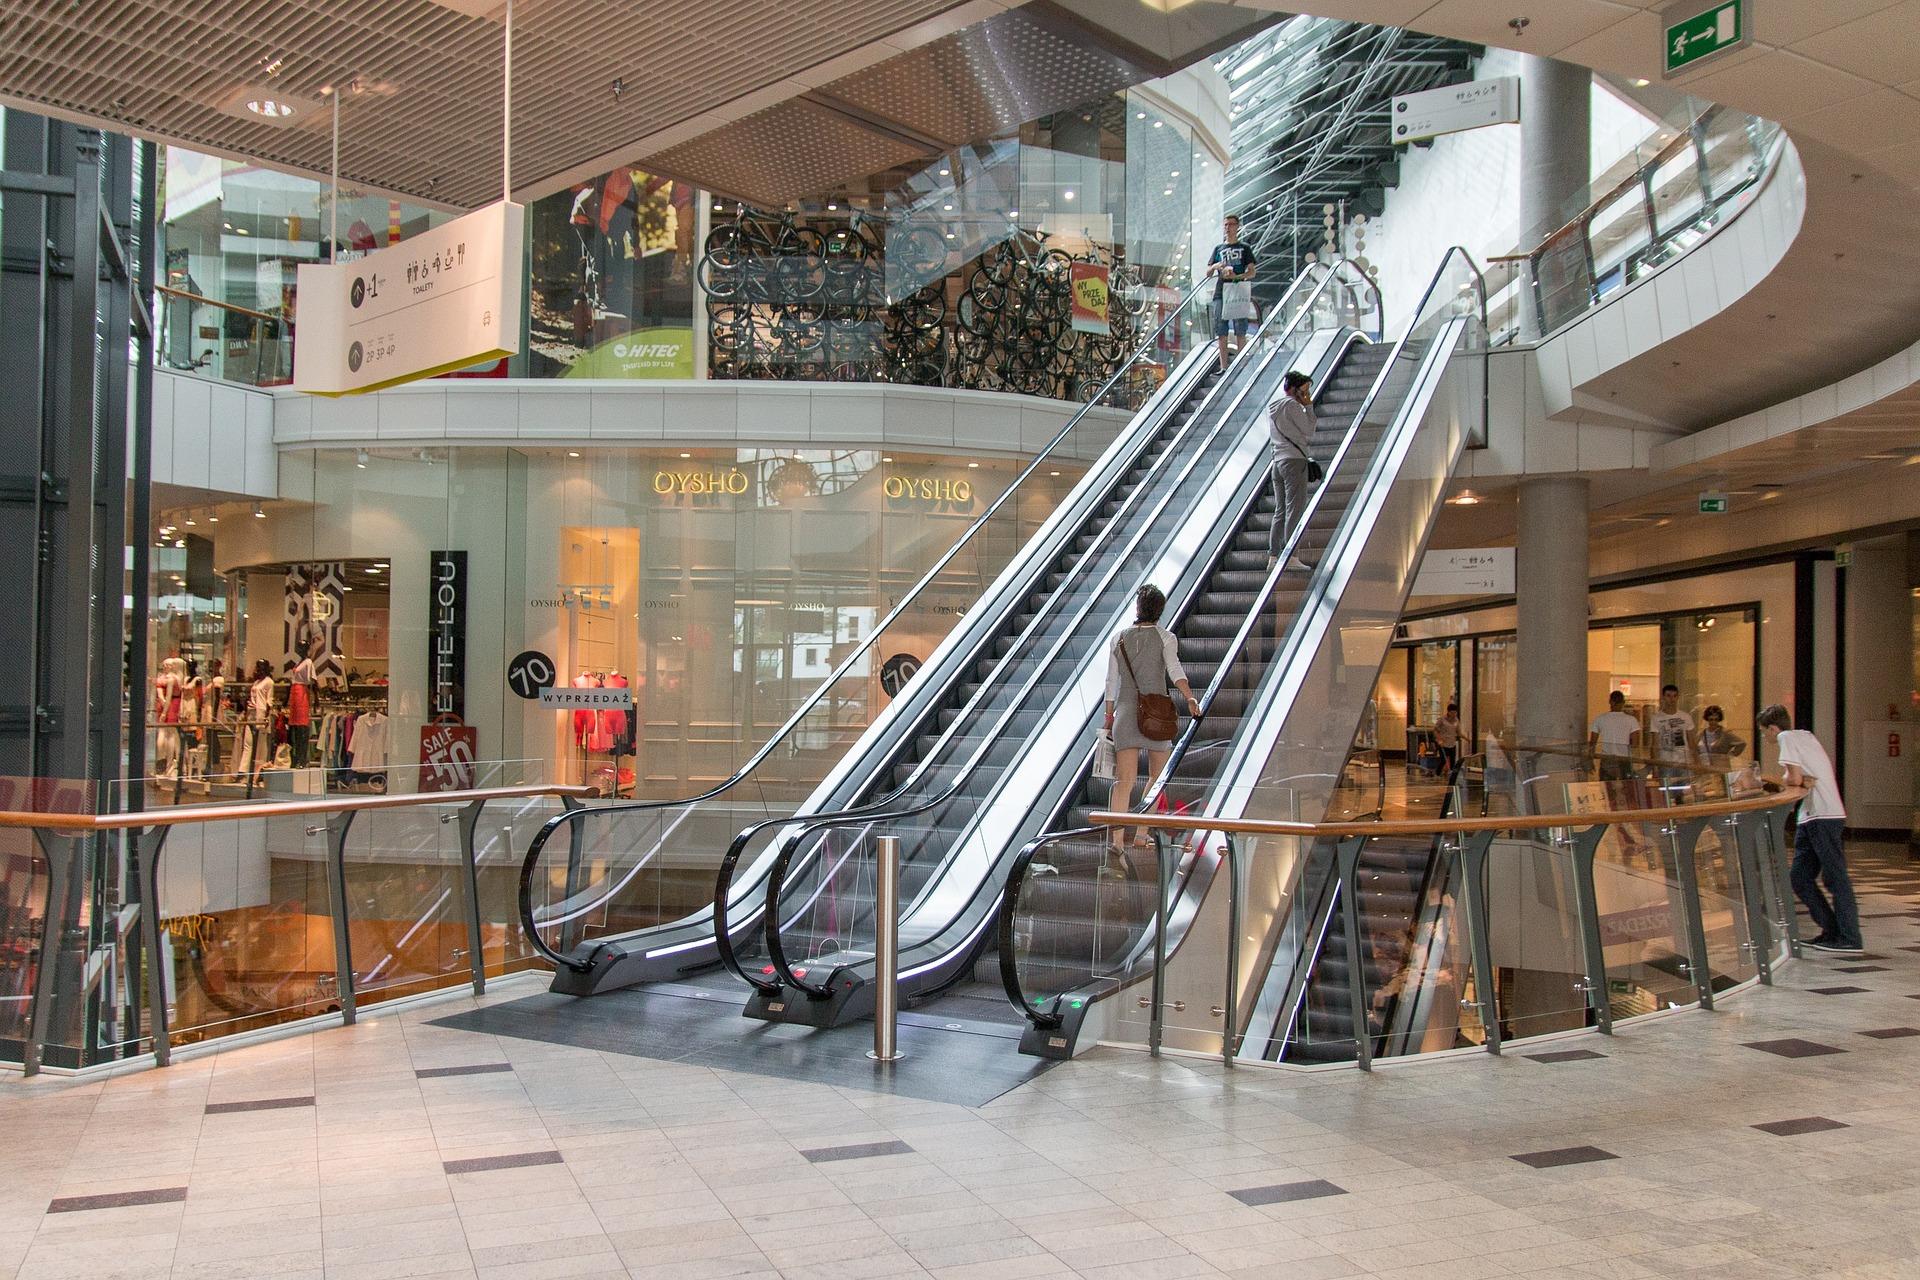 Afluencia a centros comerciales se recupera en 1T de 2021